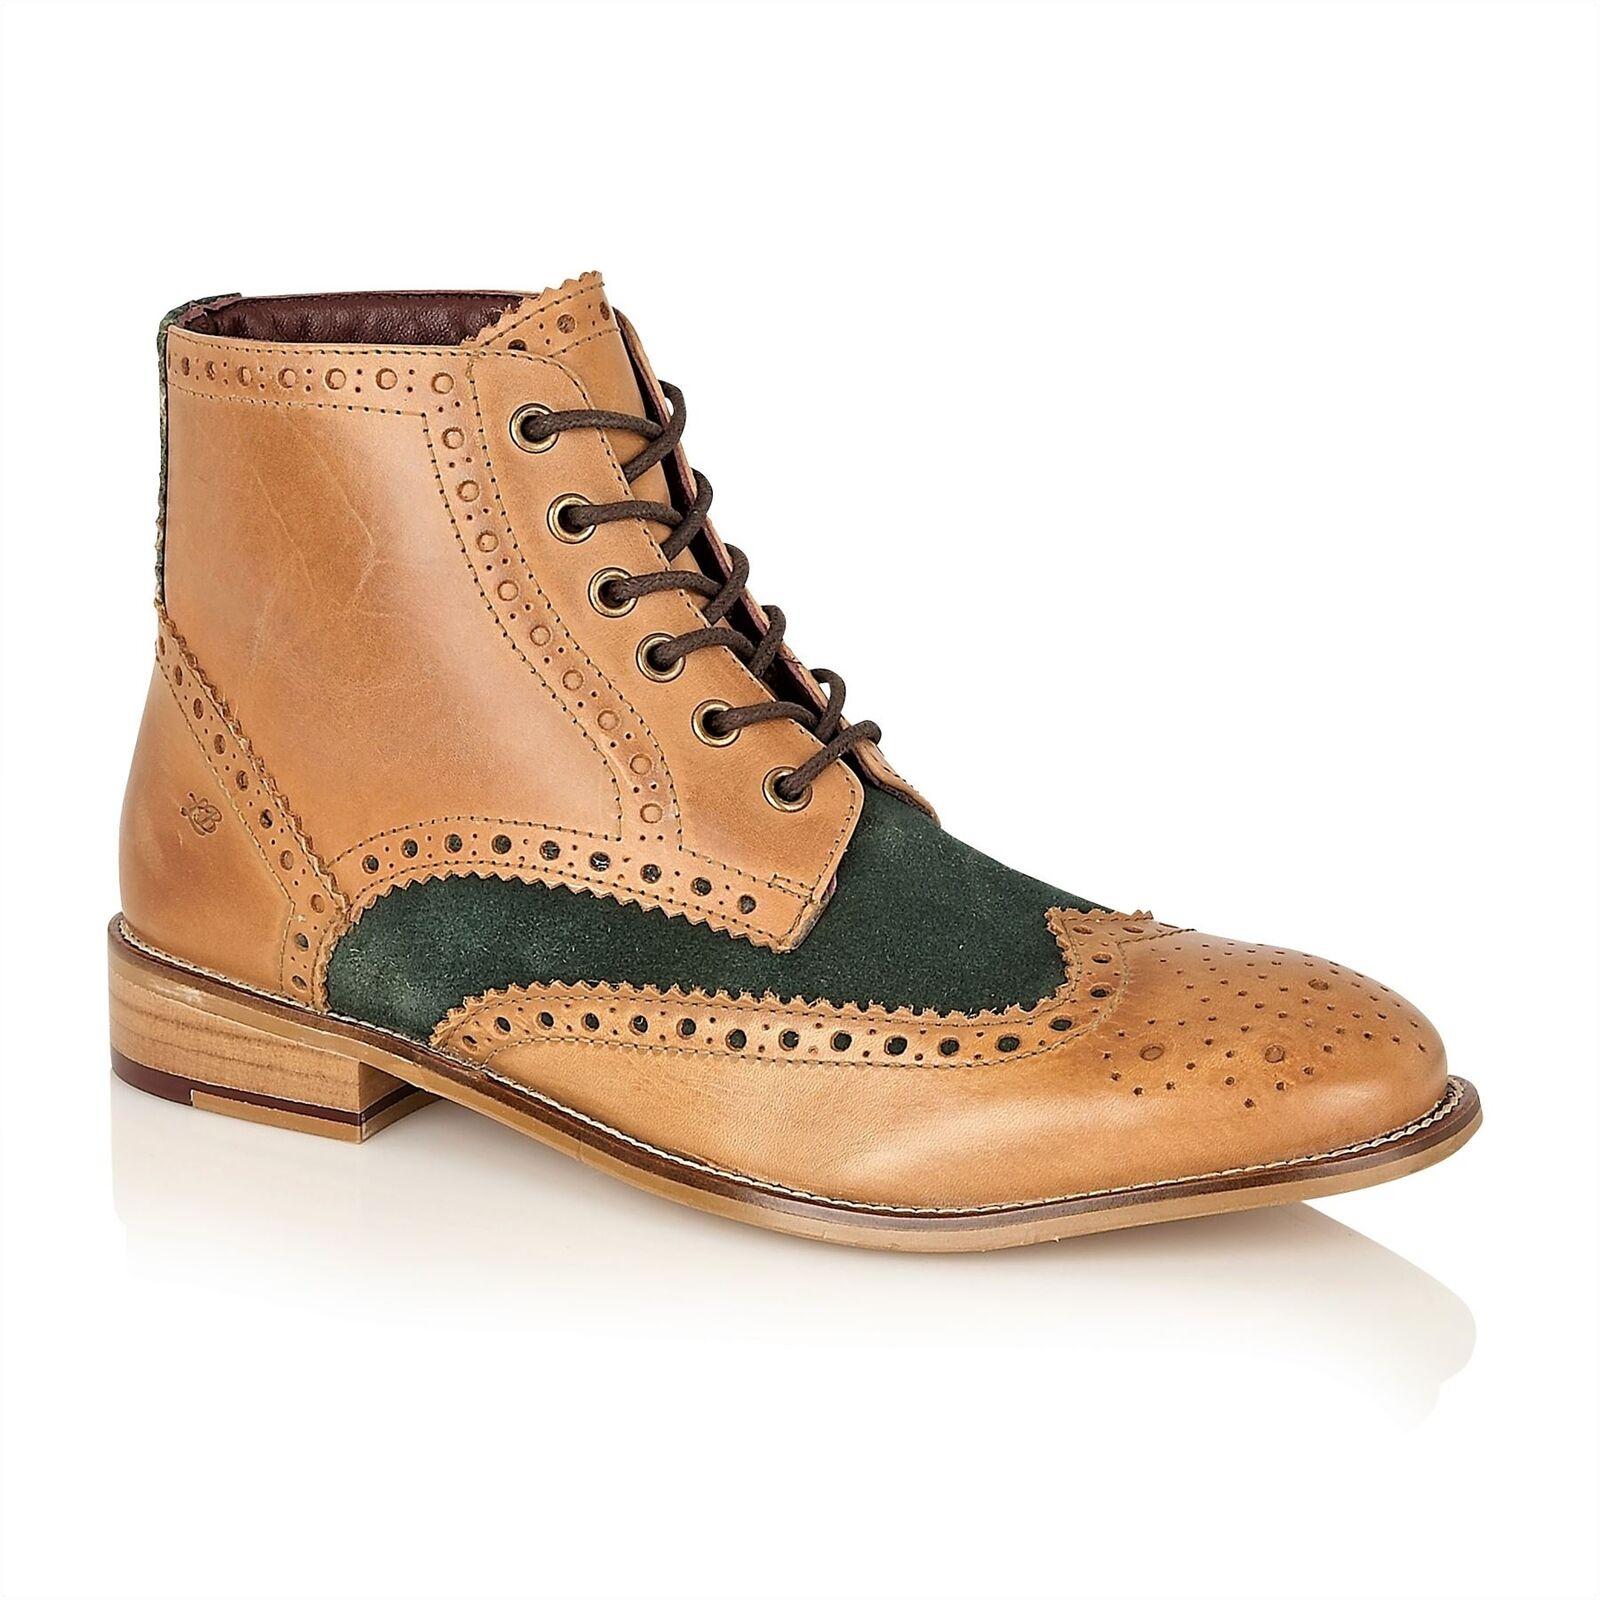 London Brogues Gatsby HI Lace  Up Formal Mens Leather stivali Tan   verde  acquisto limitato